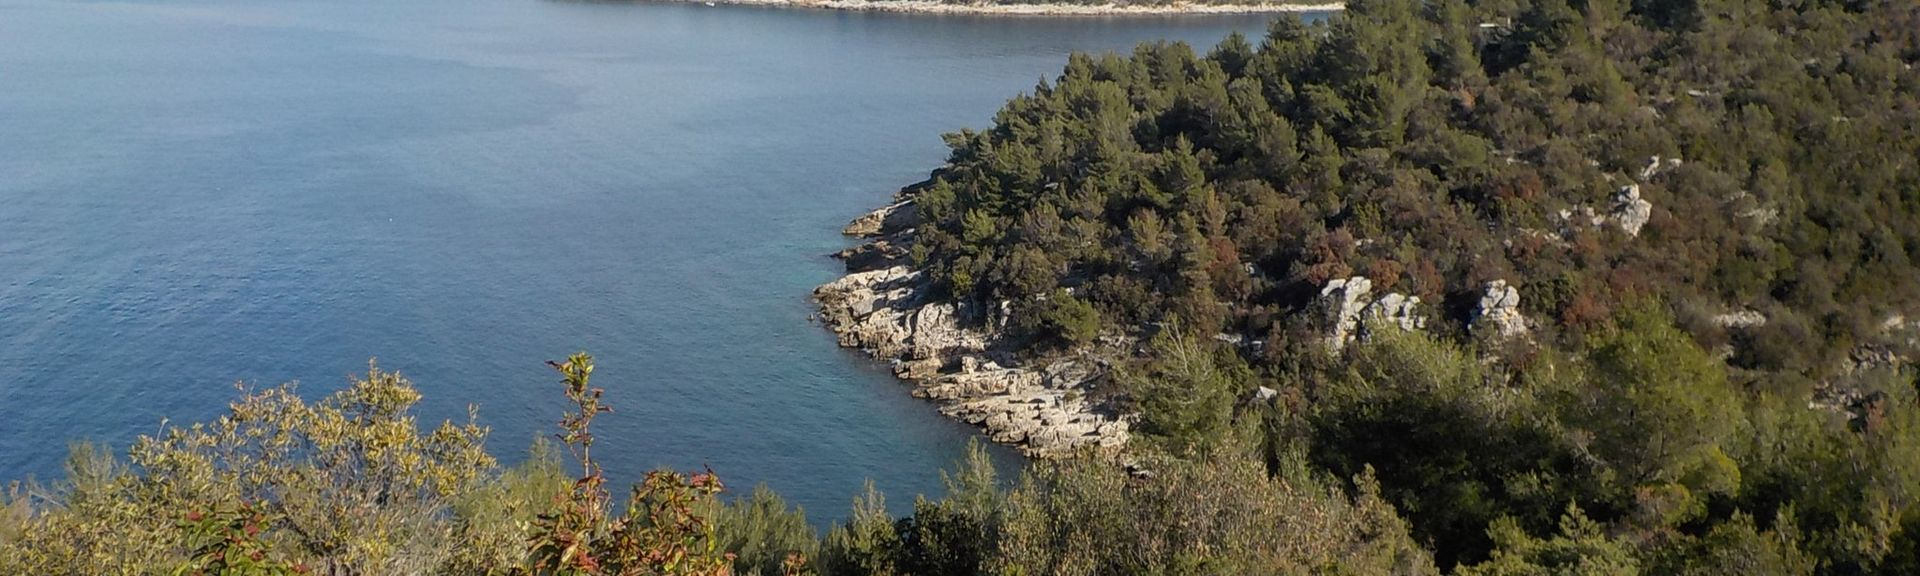 Vela Luka, Croatia